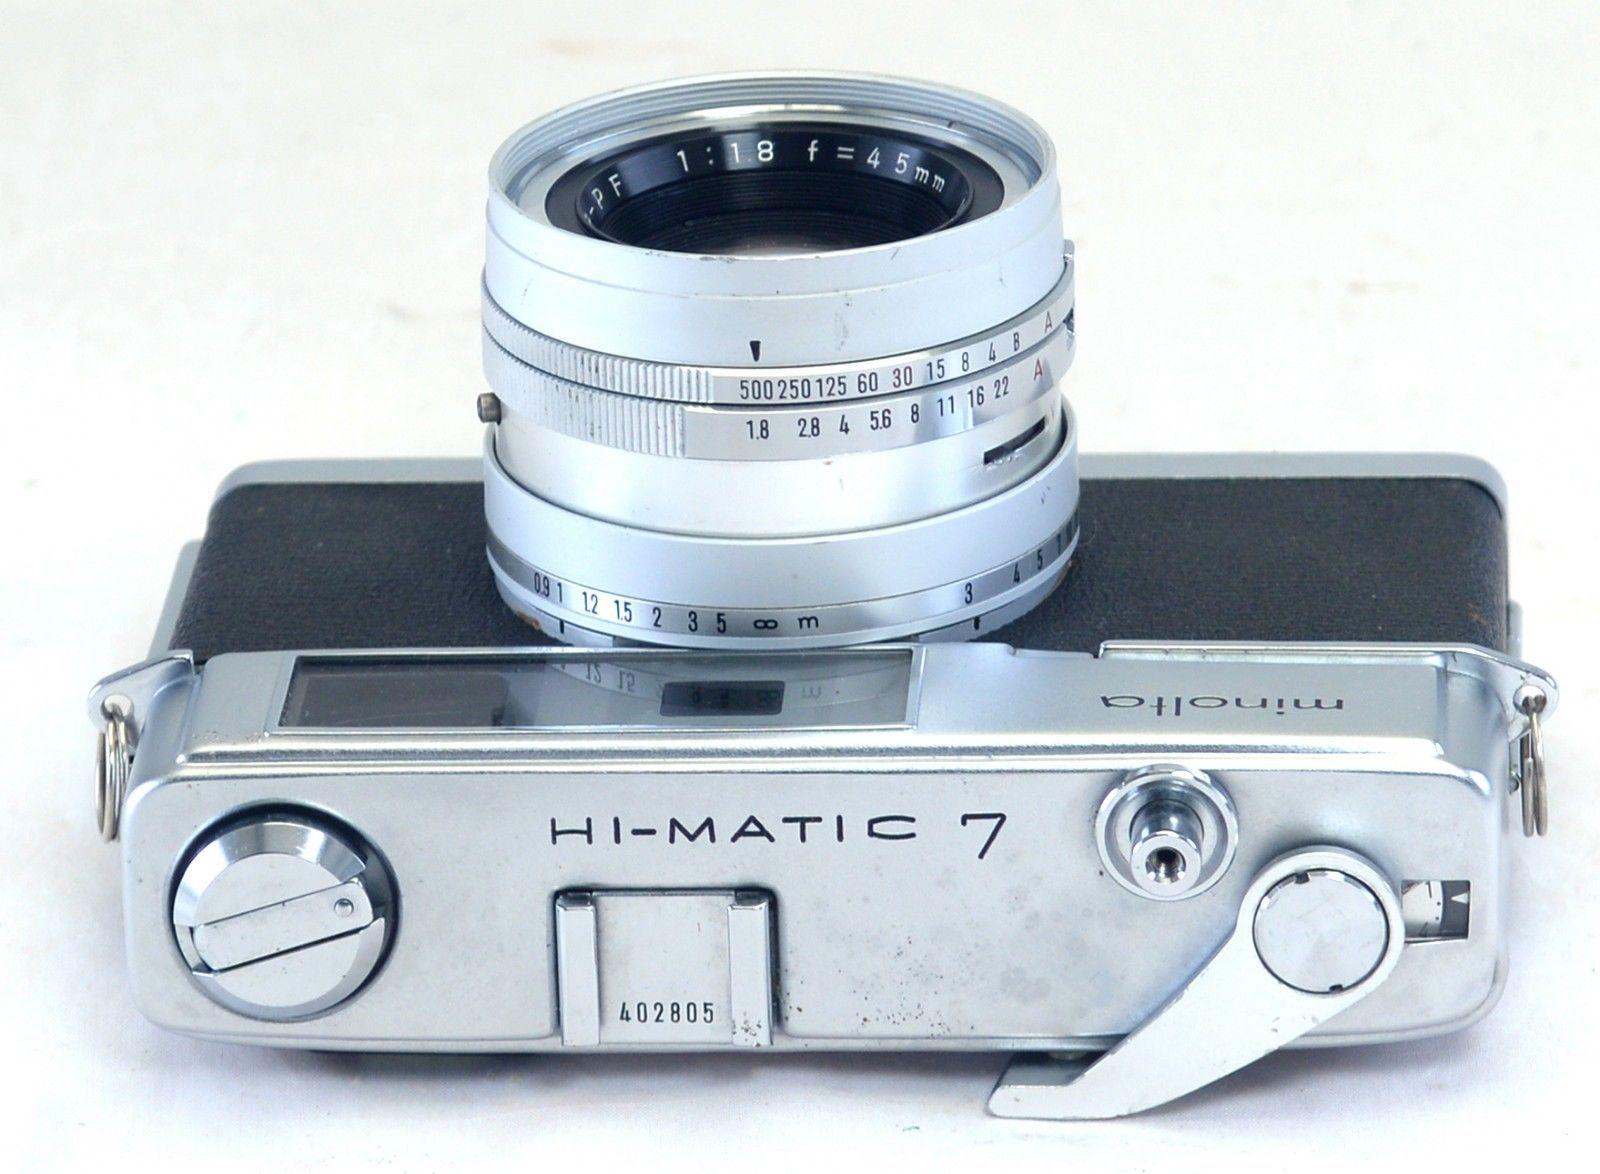 MINOLTA HI-MATIC 7 35mm Film VINTAGE Camera ROKKOR 45mm F1.8 Lens JAPAN